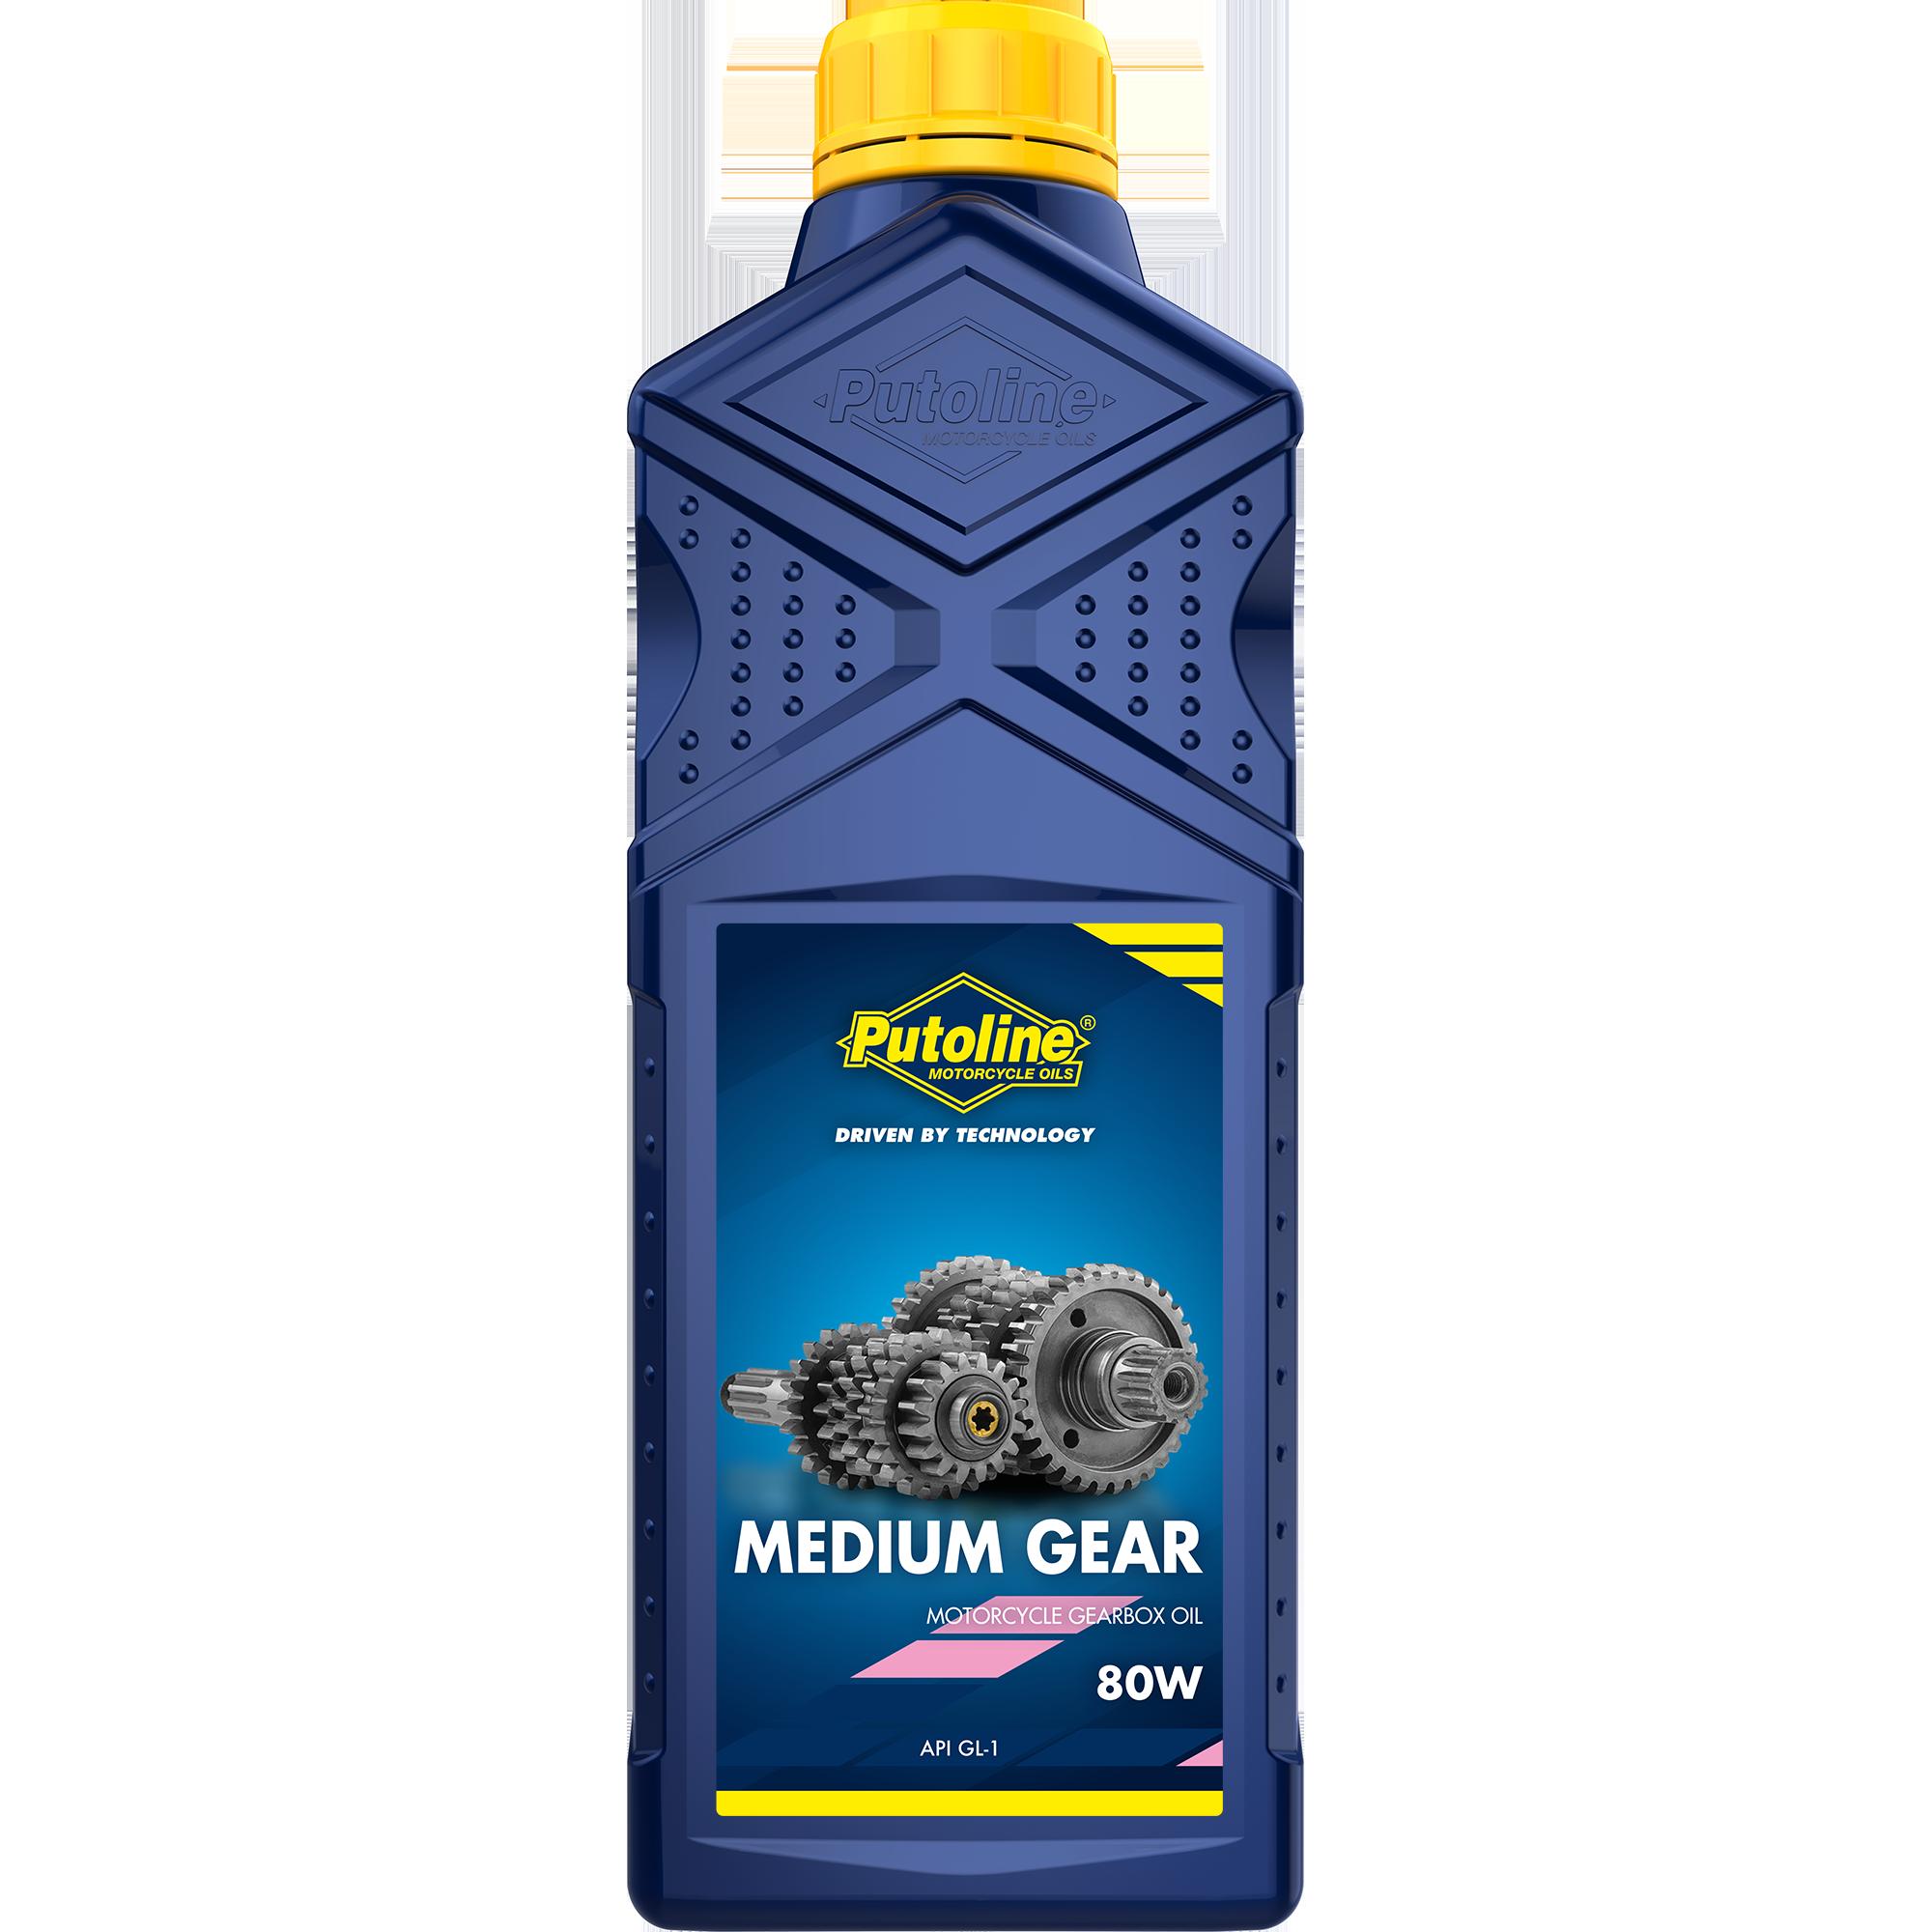 Putoline Getriebeöl Gear Medium SAE 80W 1L